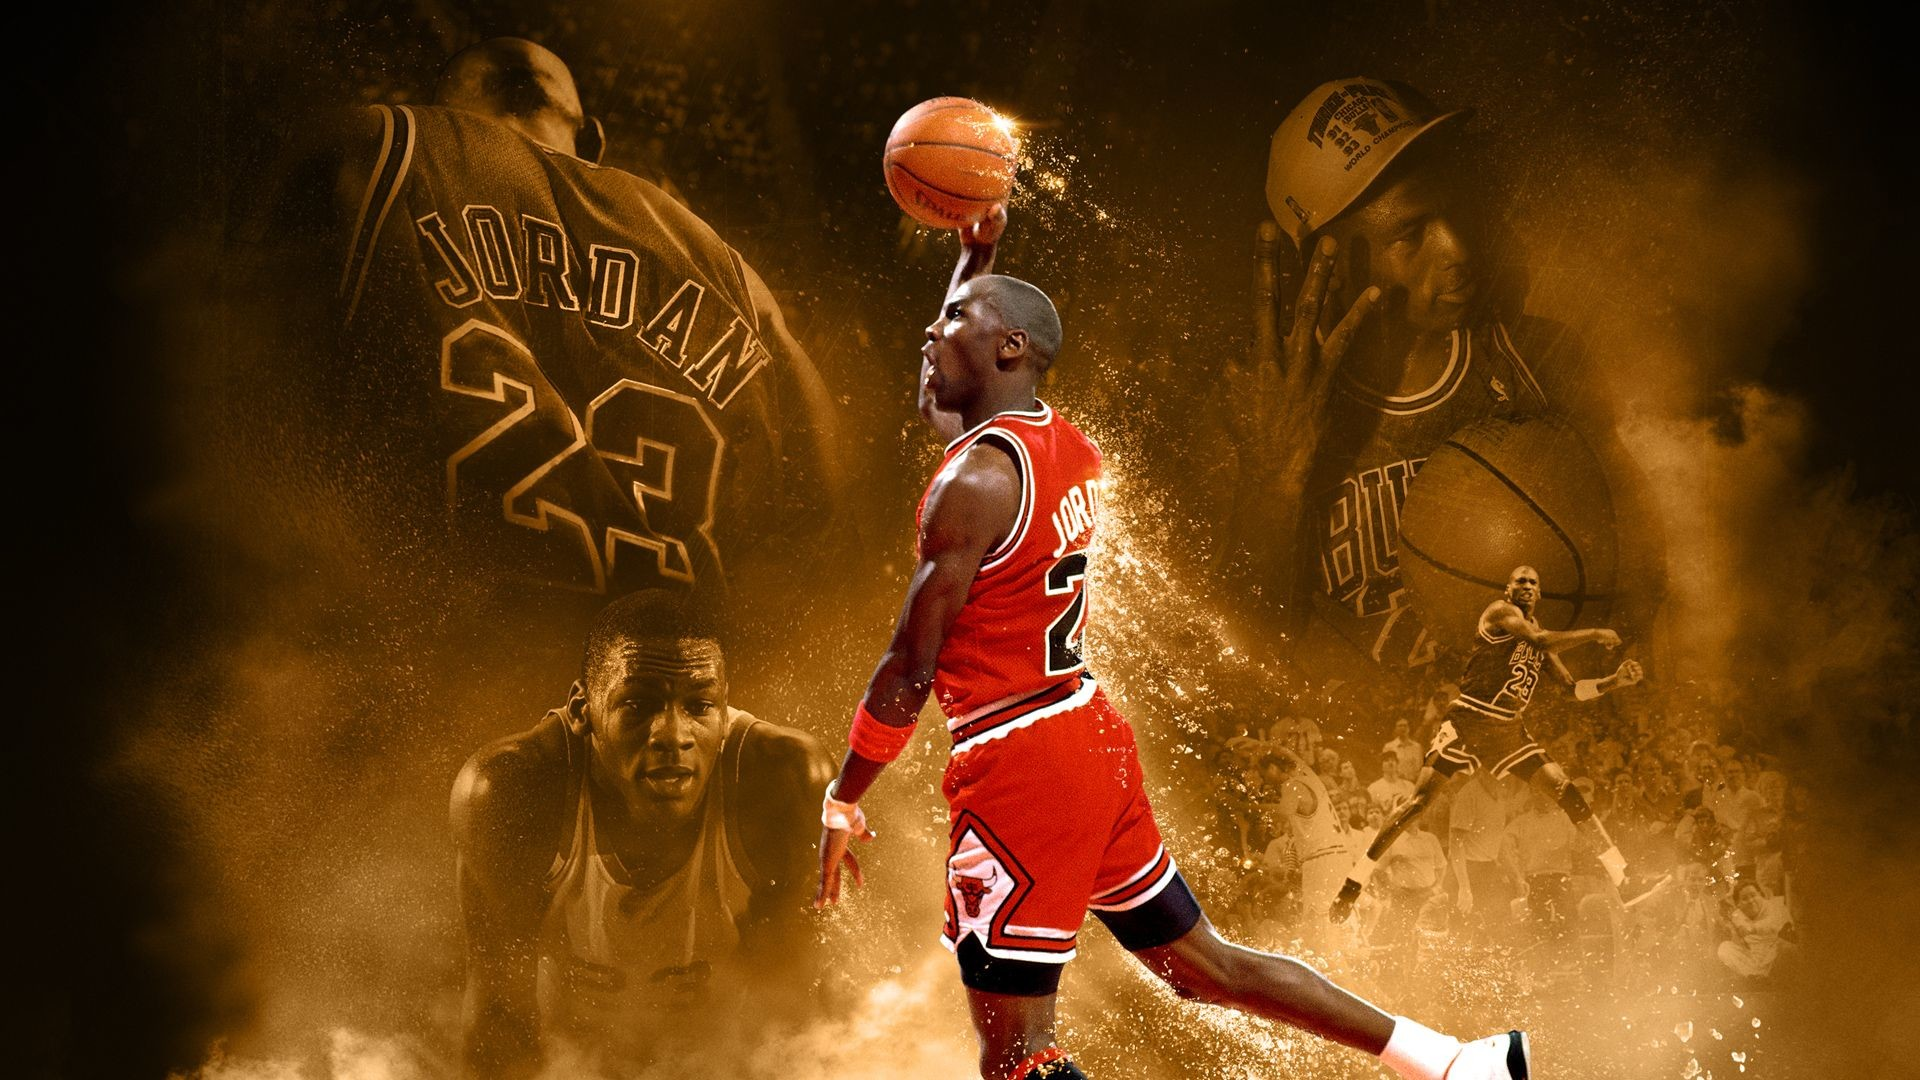 … Basketball NBA Wallpapers Widescreen 6 …